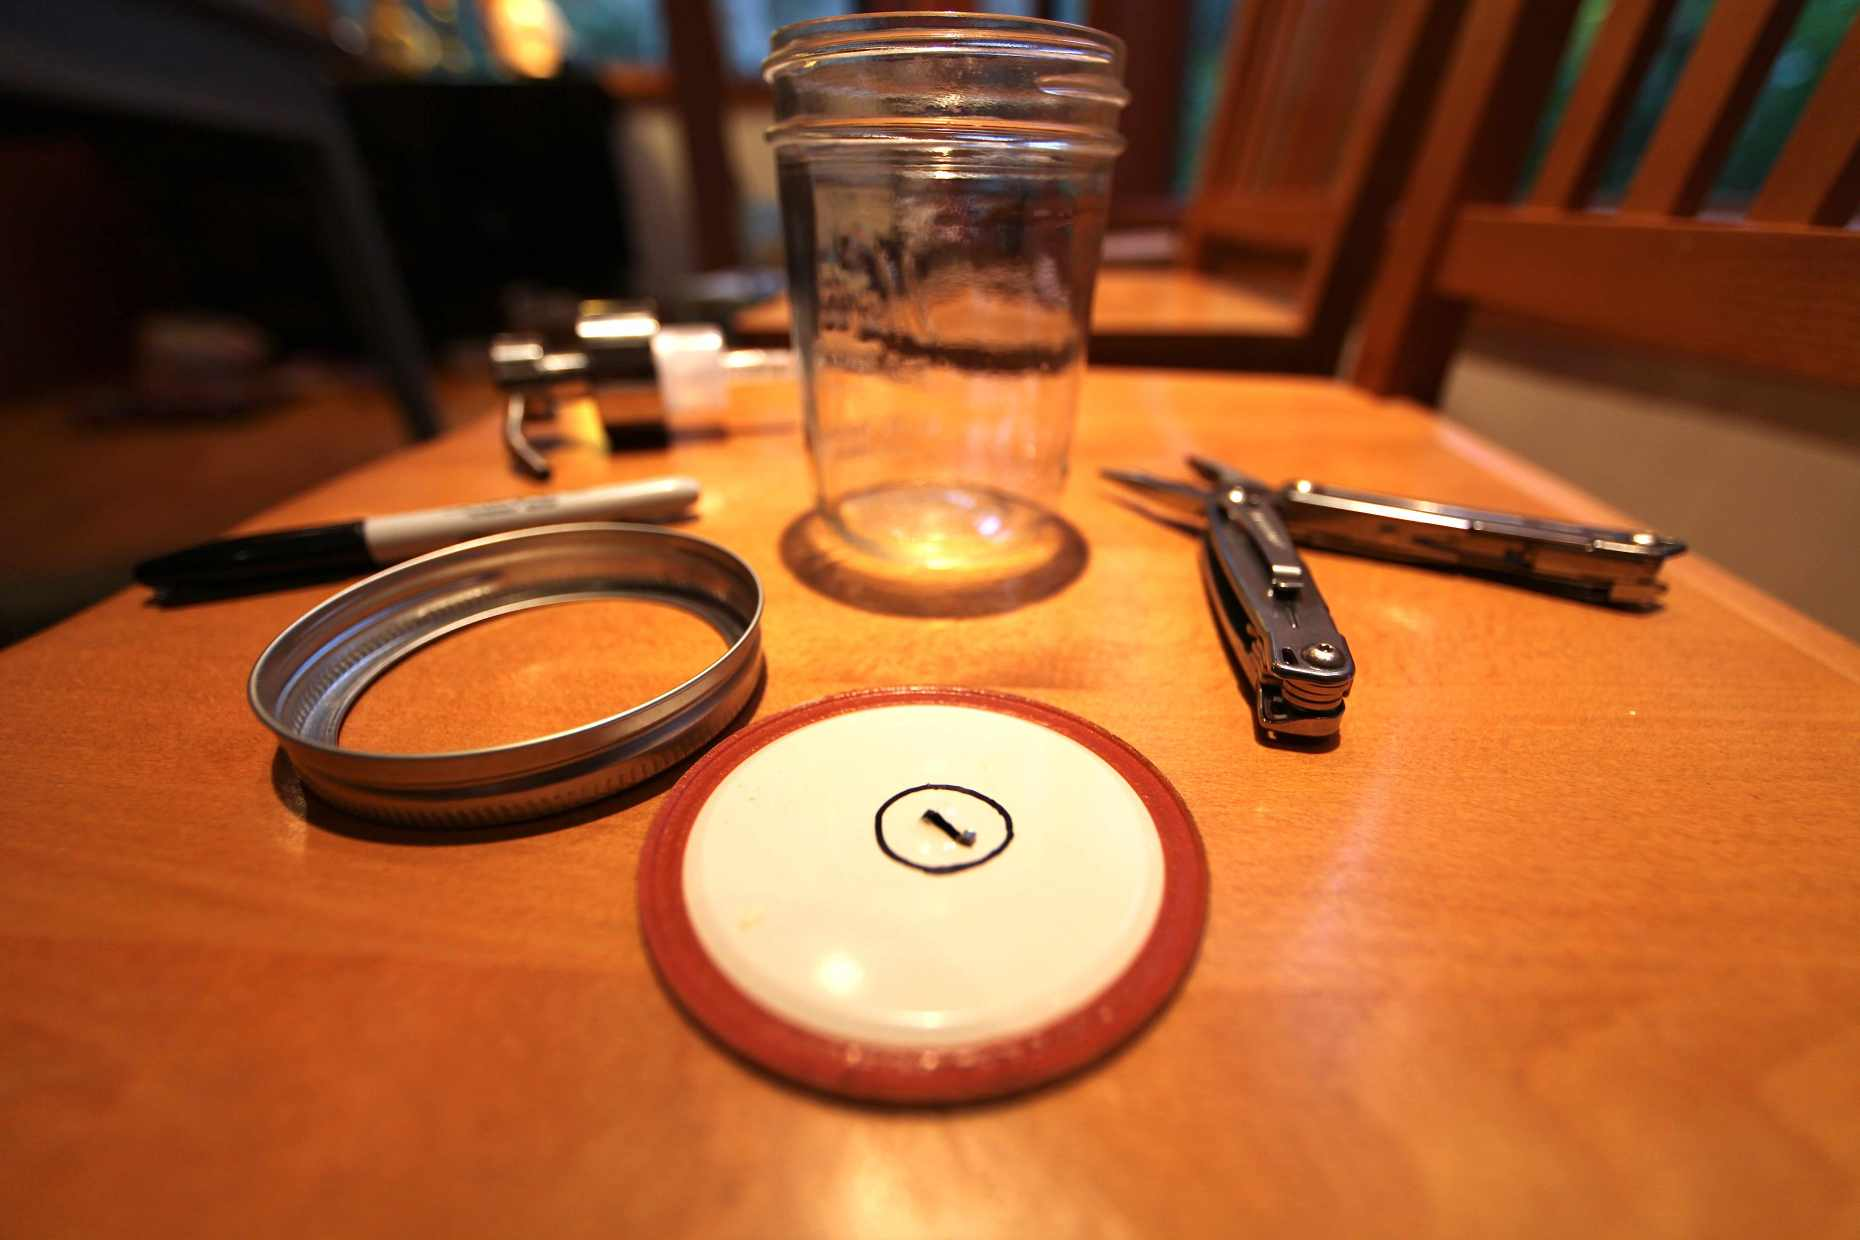 Mason Jar + Lid, Pliers, Sharpie, and Pump. Photo © Liesl Clark